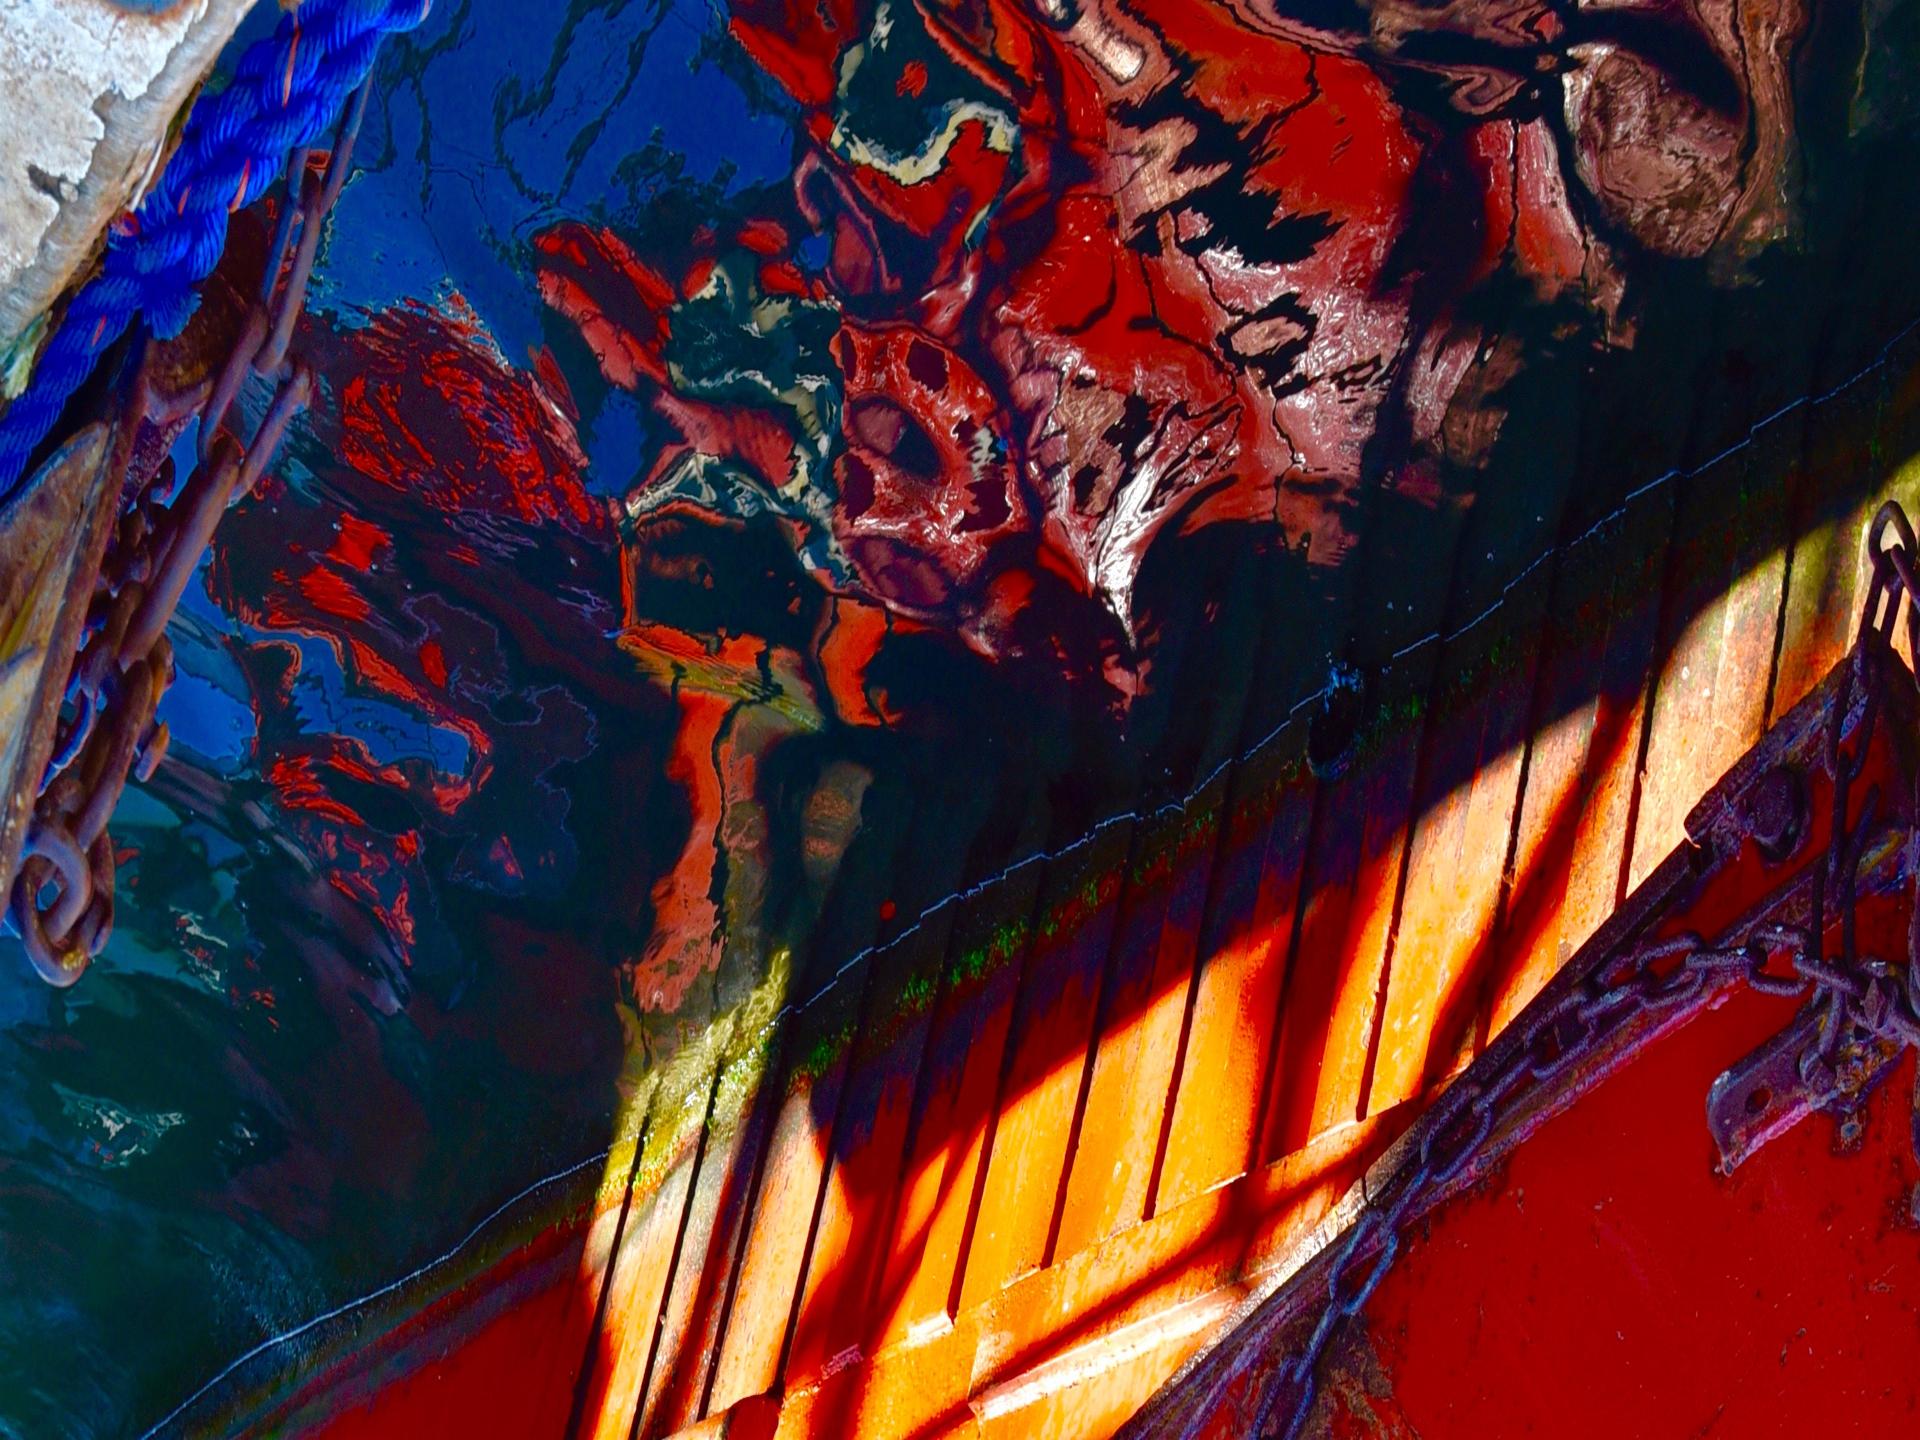 Montauk Reflections #8 by Kat O'Neill